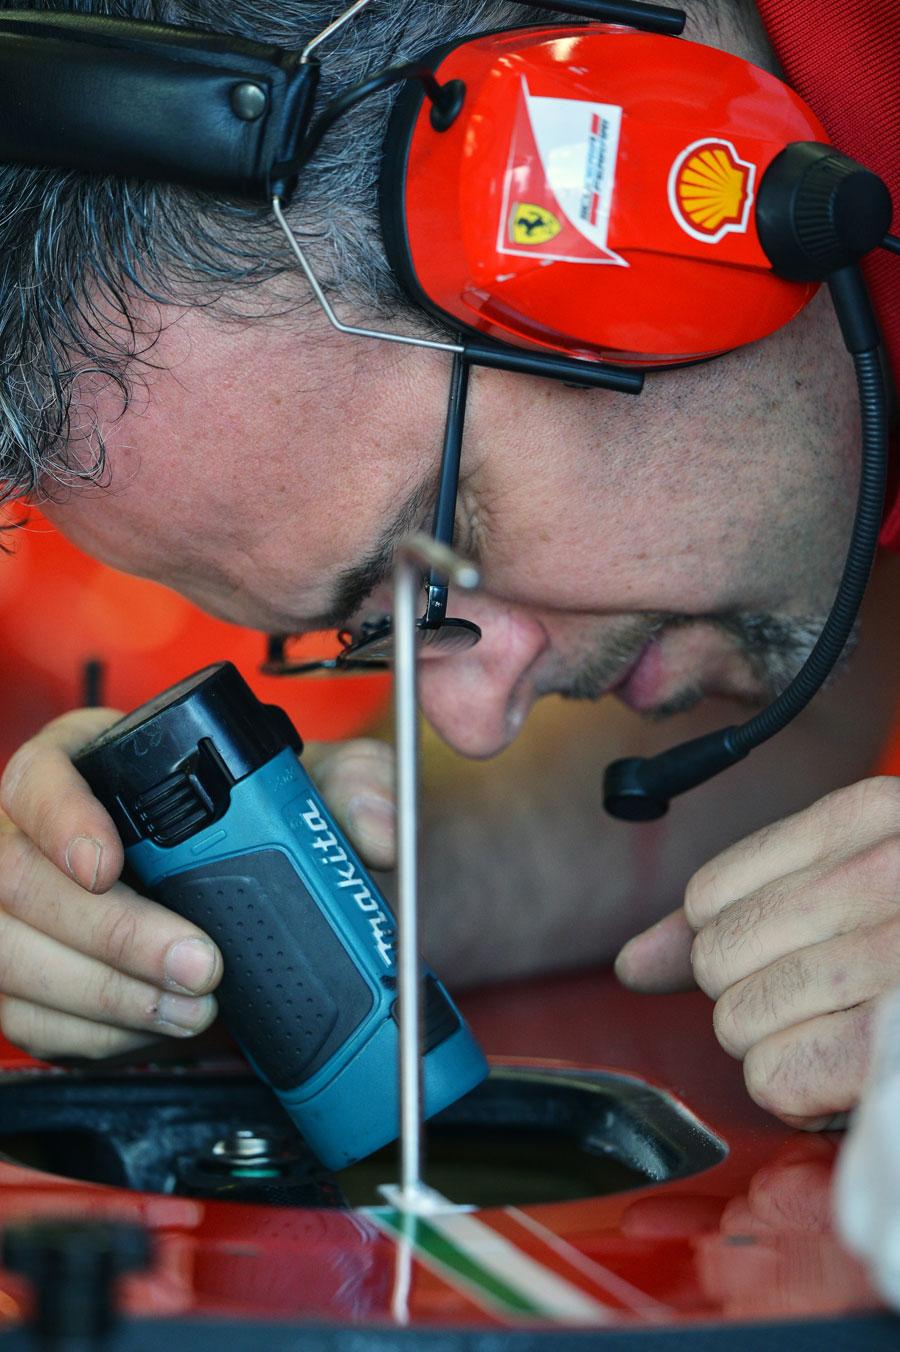 A Ferrari mechanic hard at work